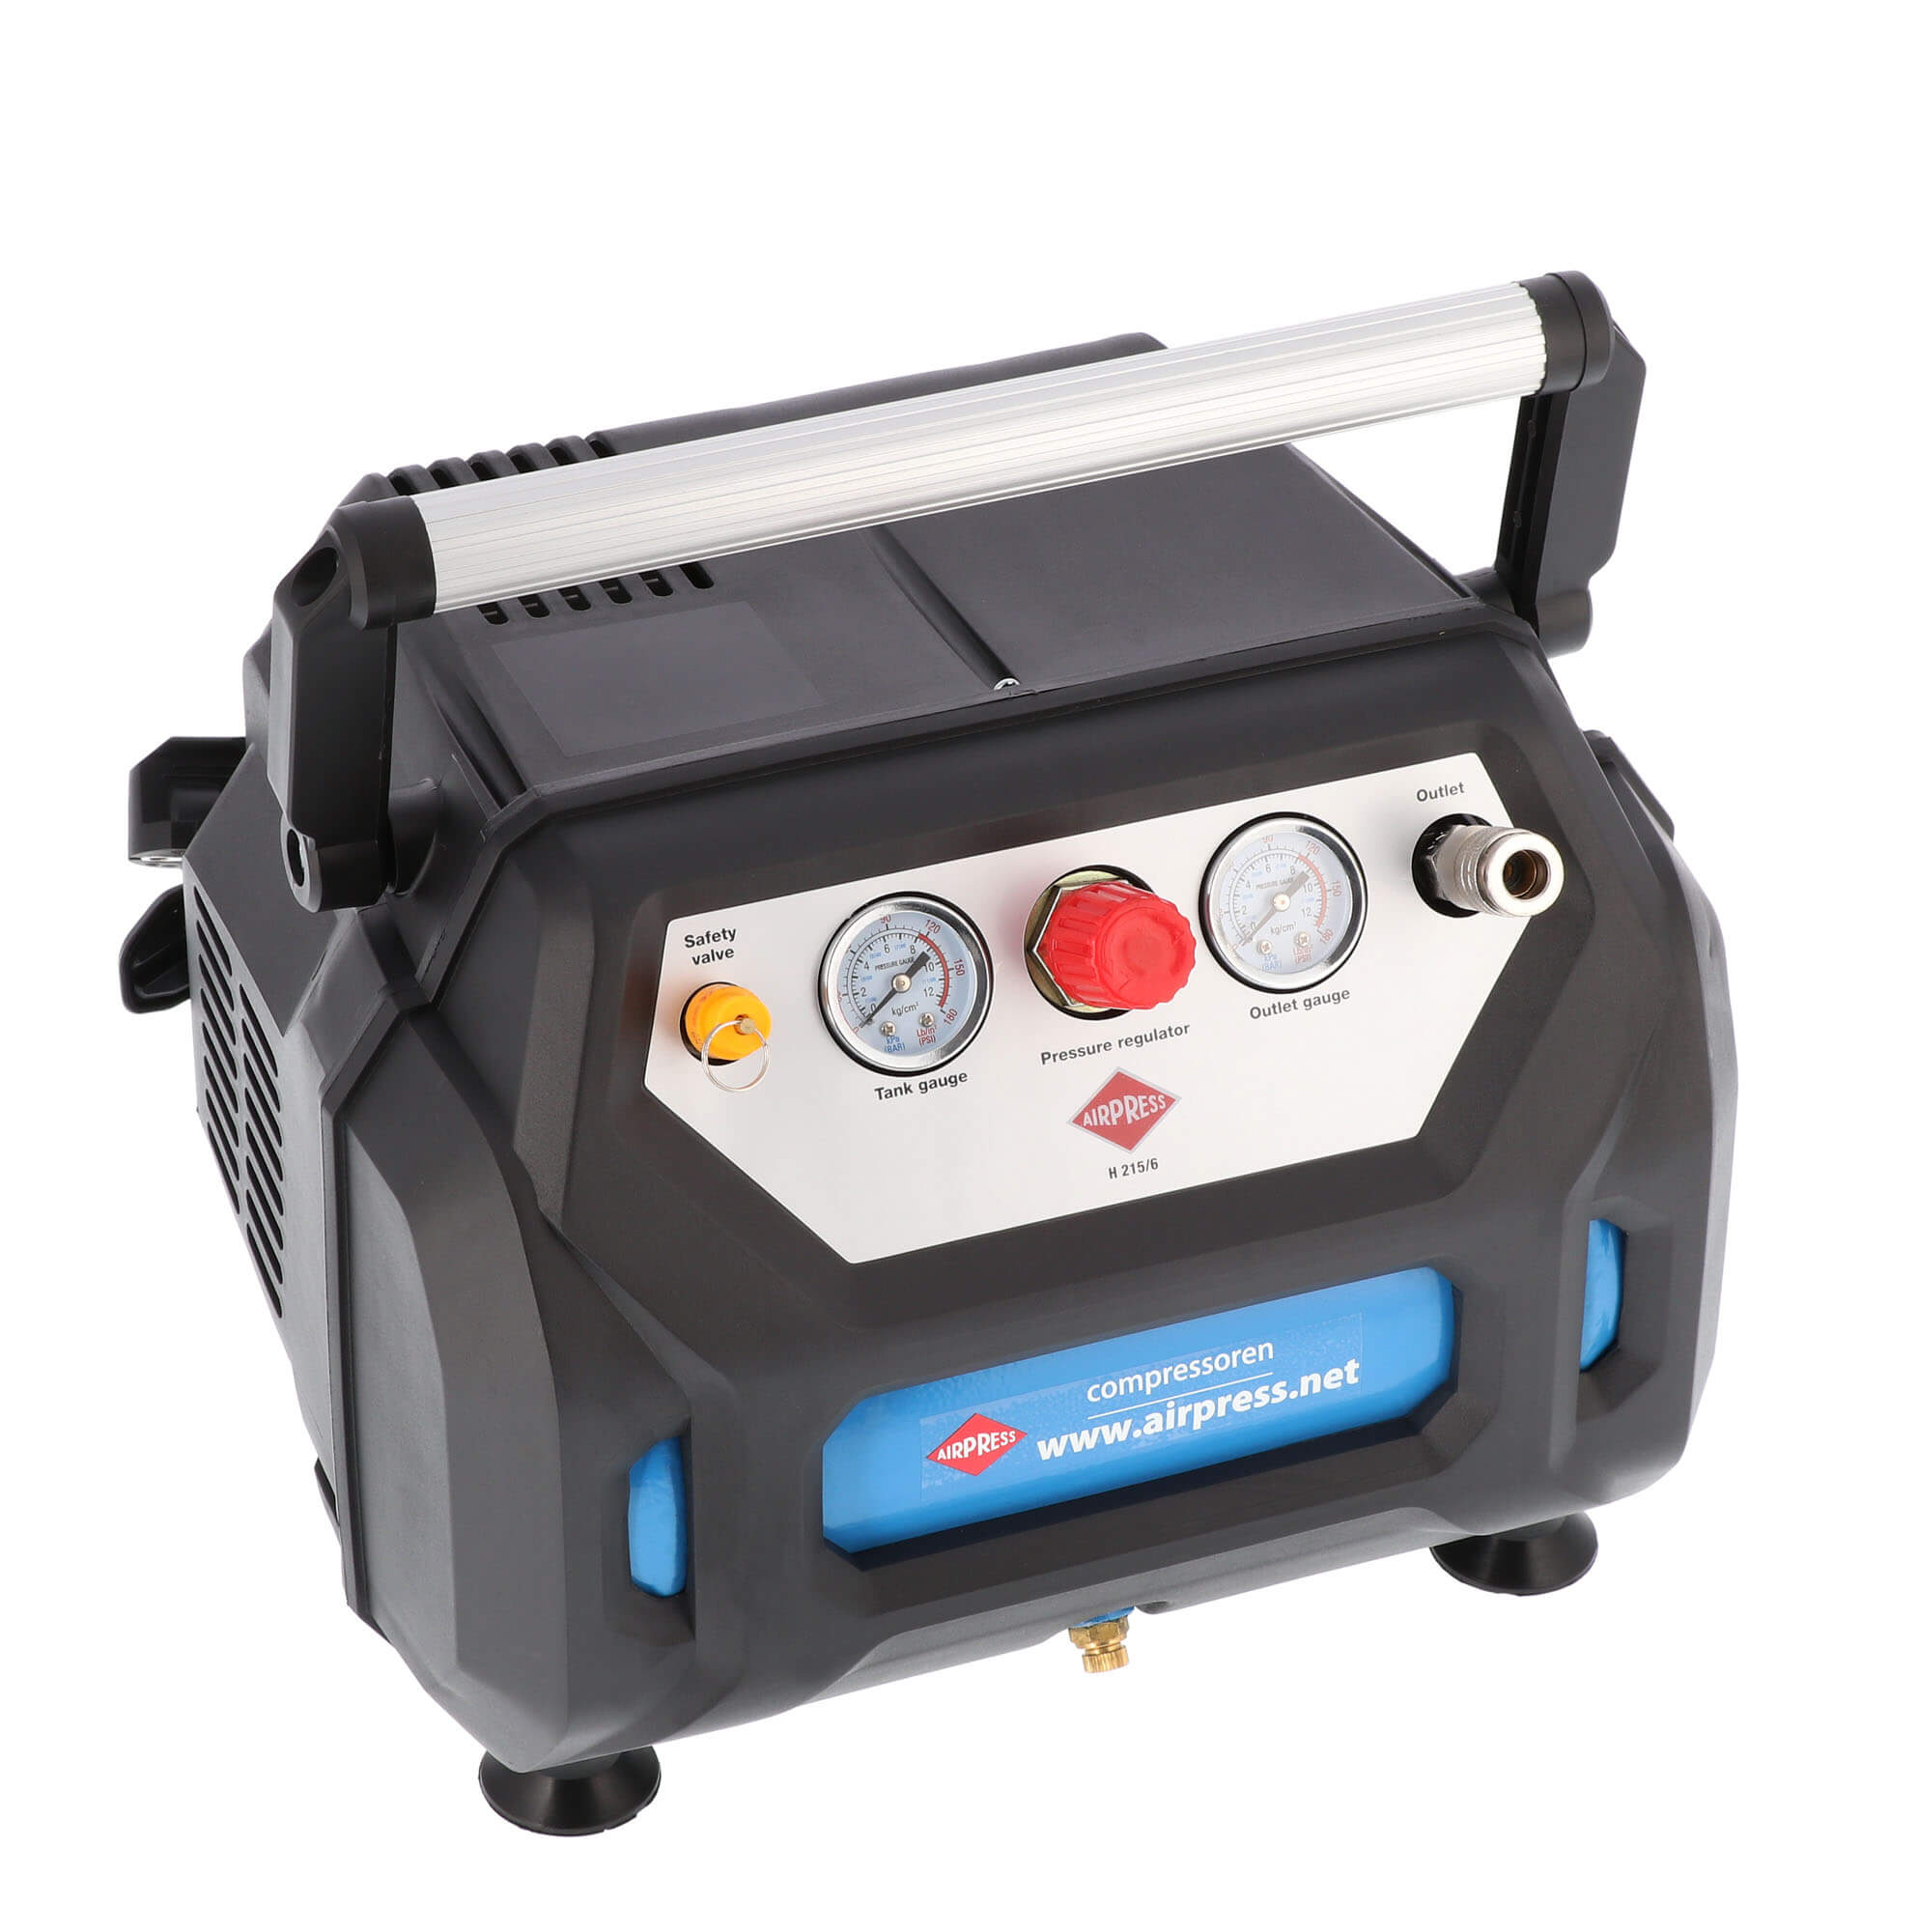 Compresseur sans huile H 215-6 8 bar 1,5 cv 92 l/min 6 L